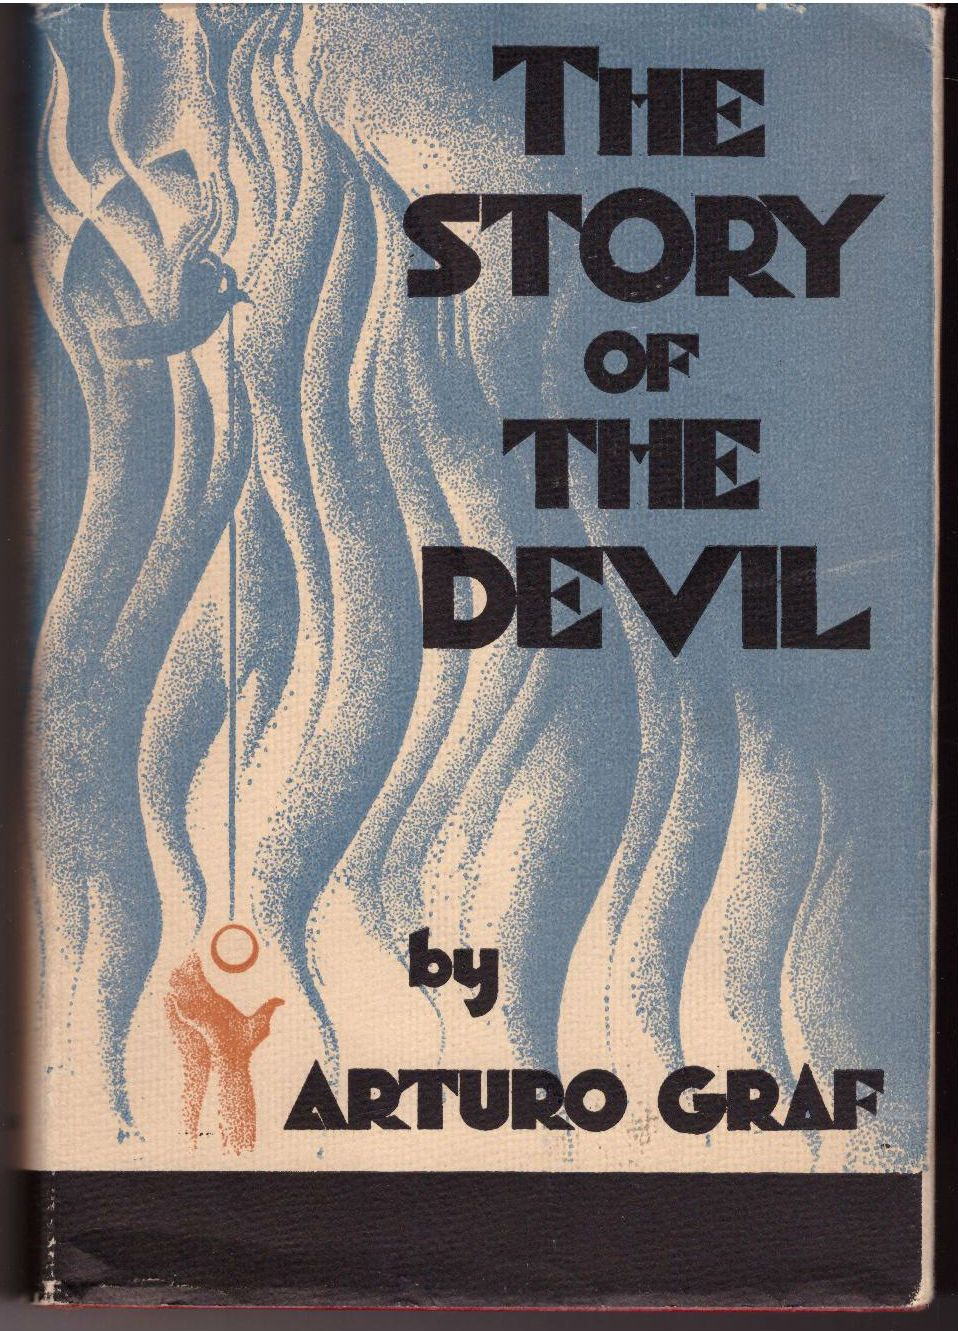 The story of the devil,, Graf, Arturo